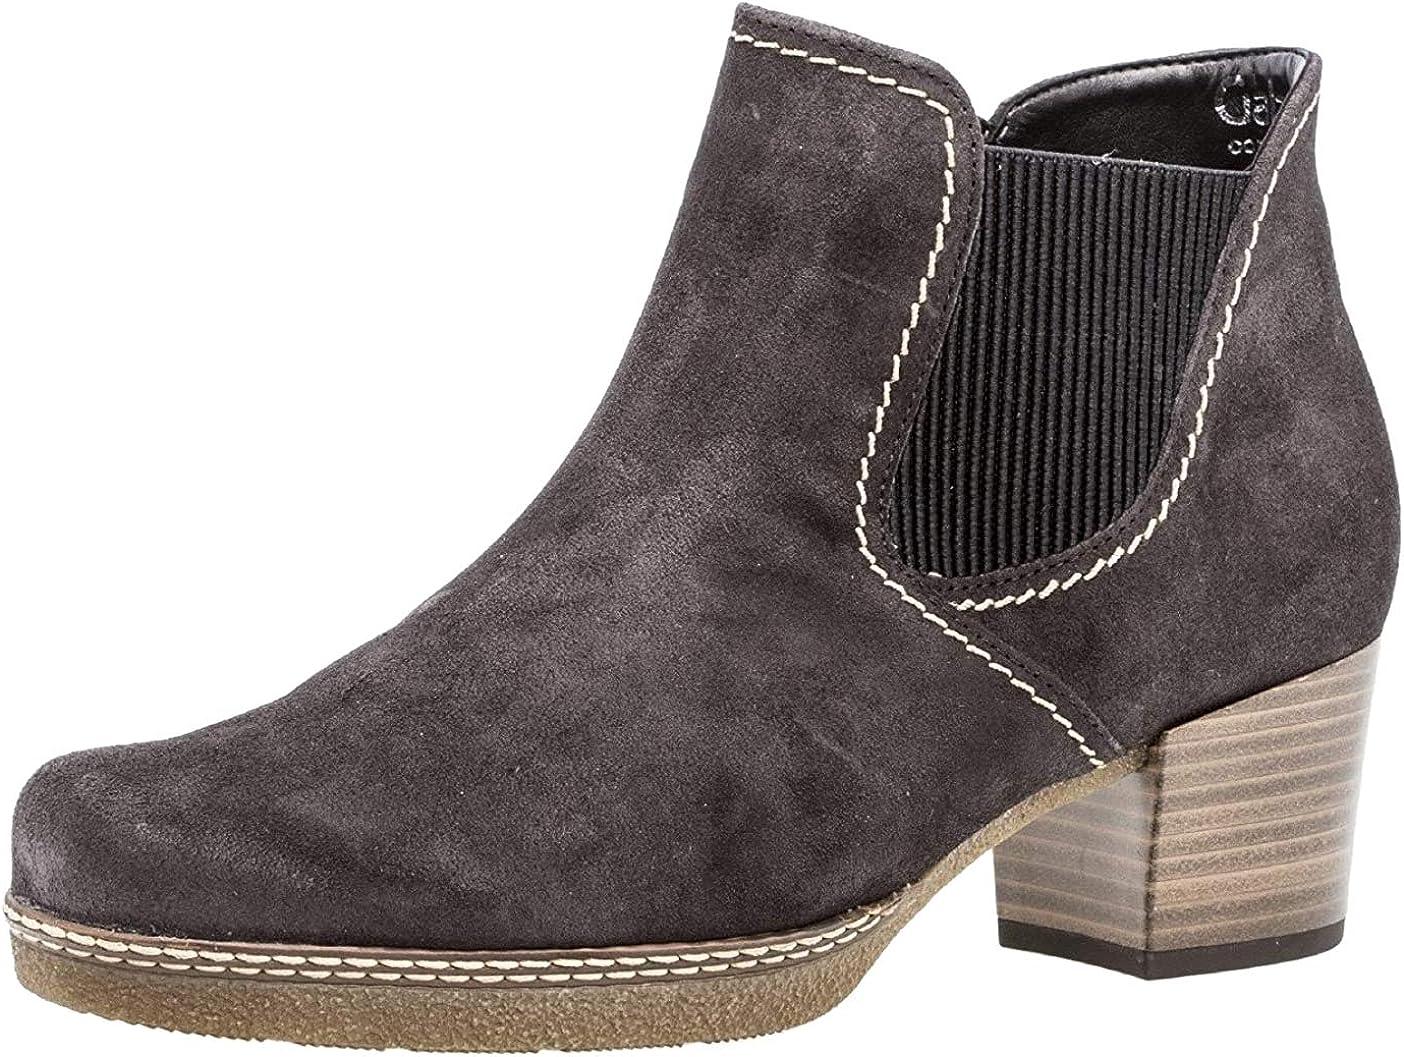 Gabor Ankle Boot Lilia 96.661: Amazon